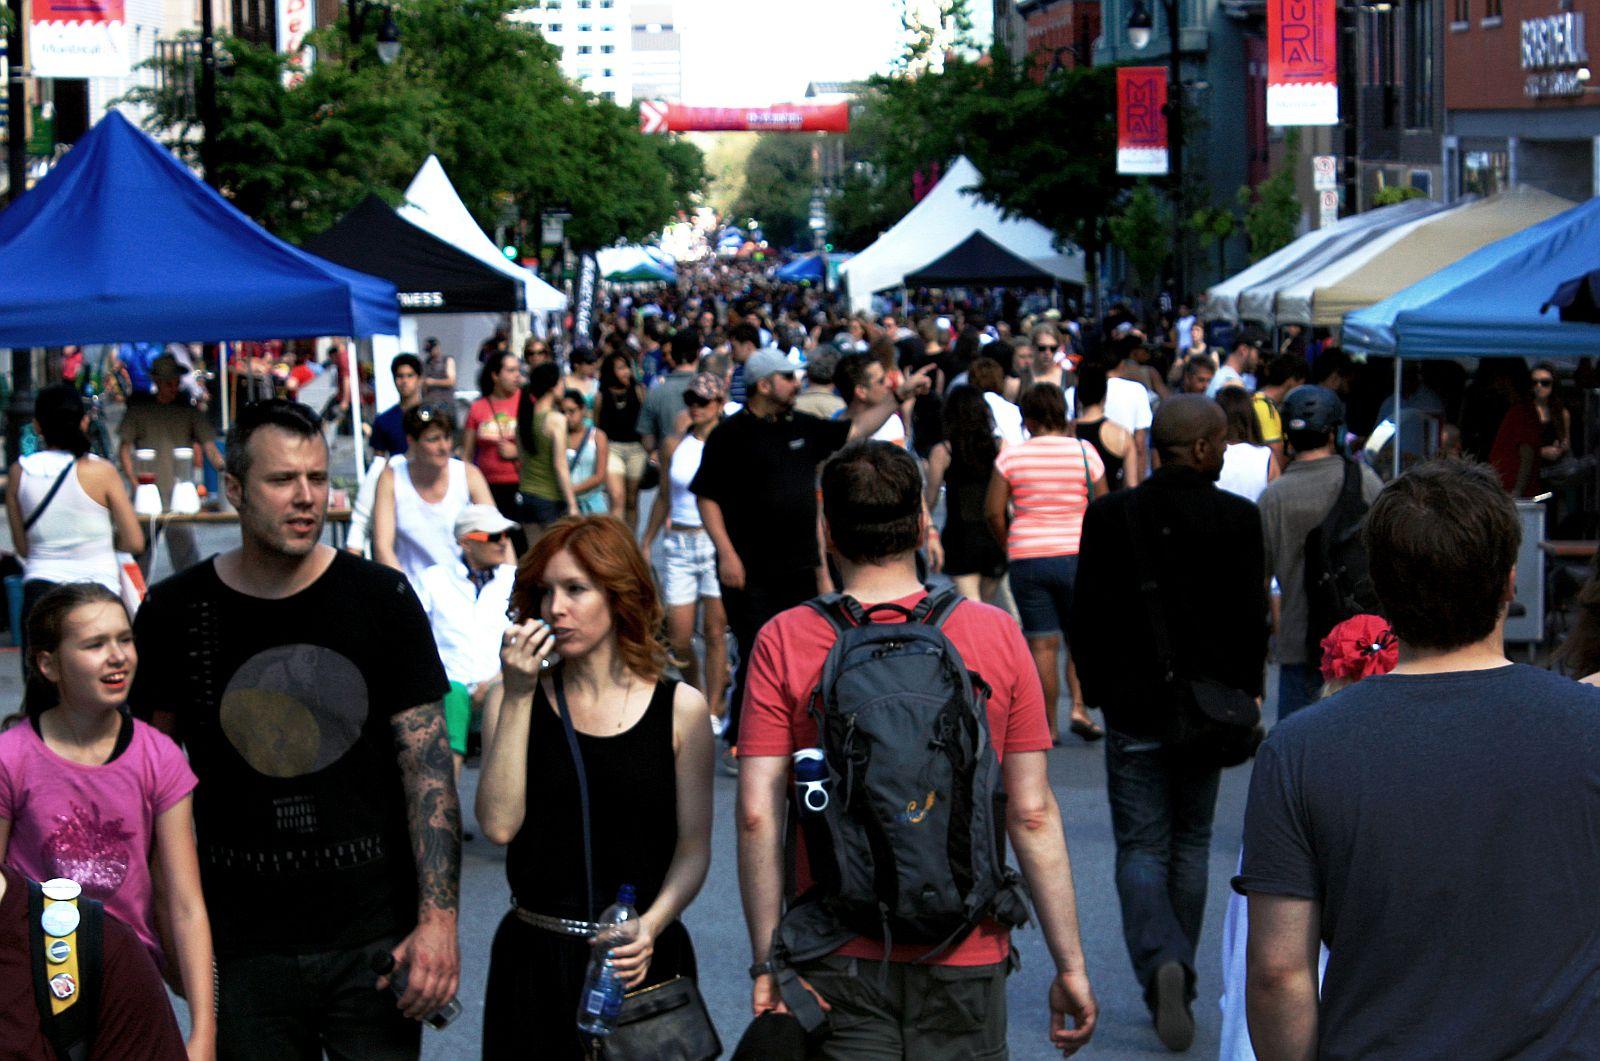 St laurent street fairs sidewalk sales ventes trottoirs for Meuble montreal st laurent